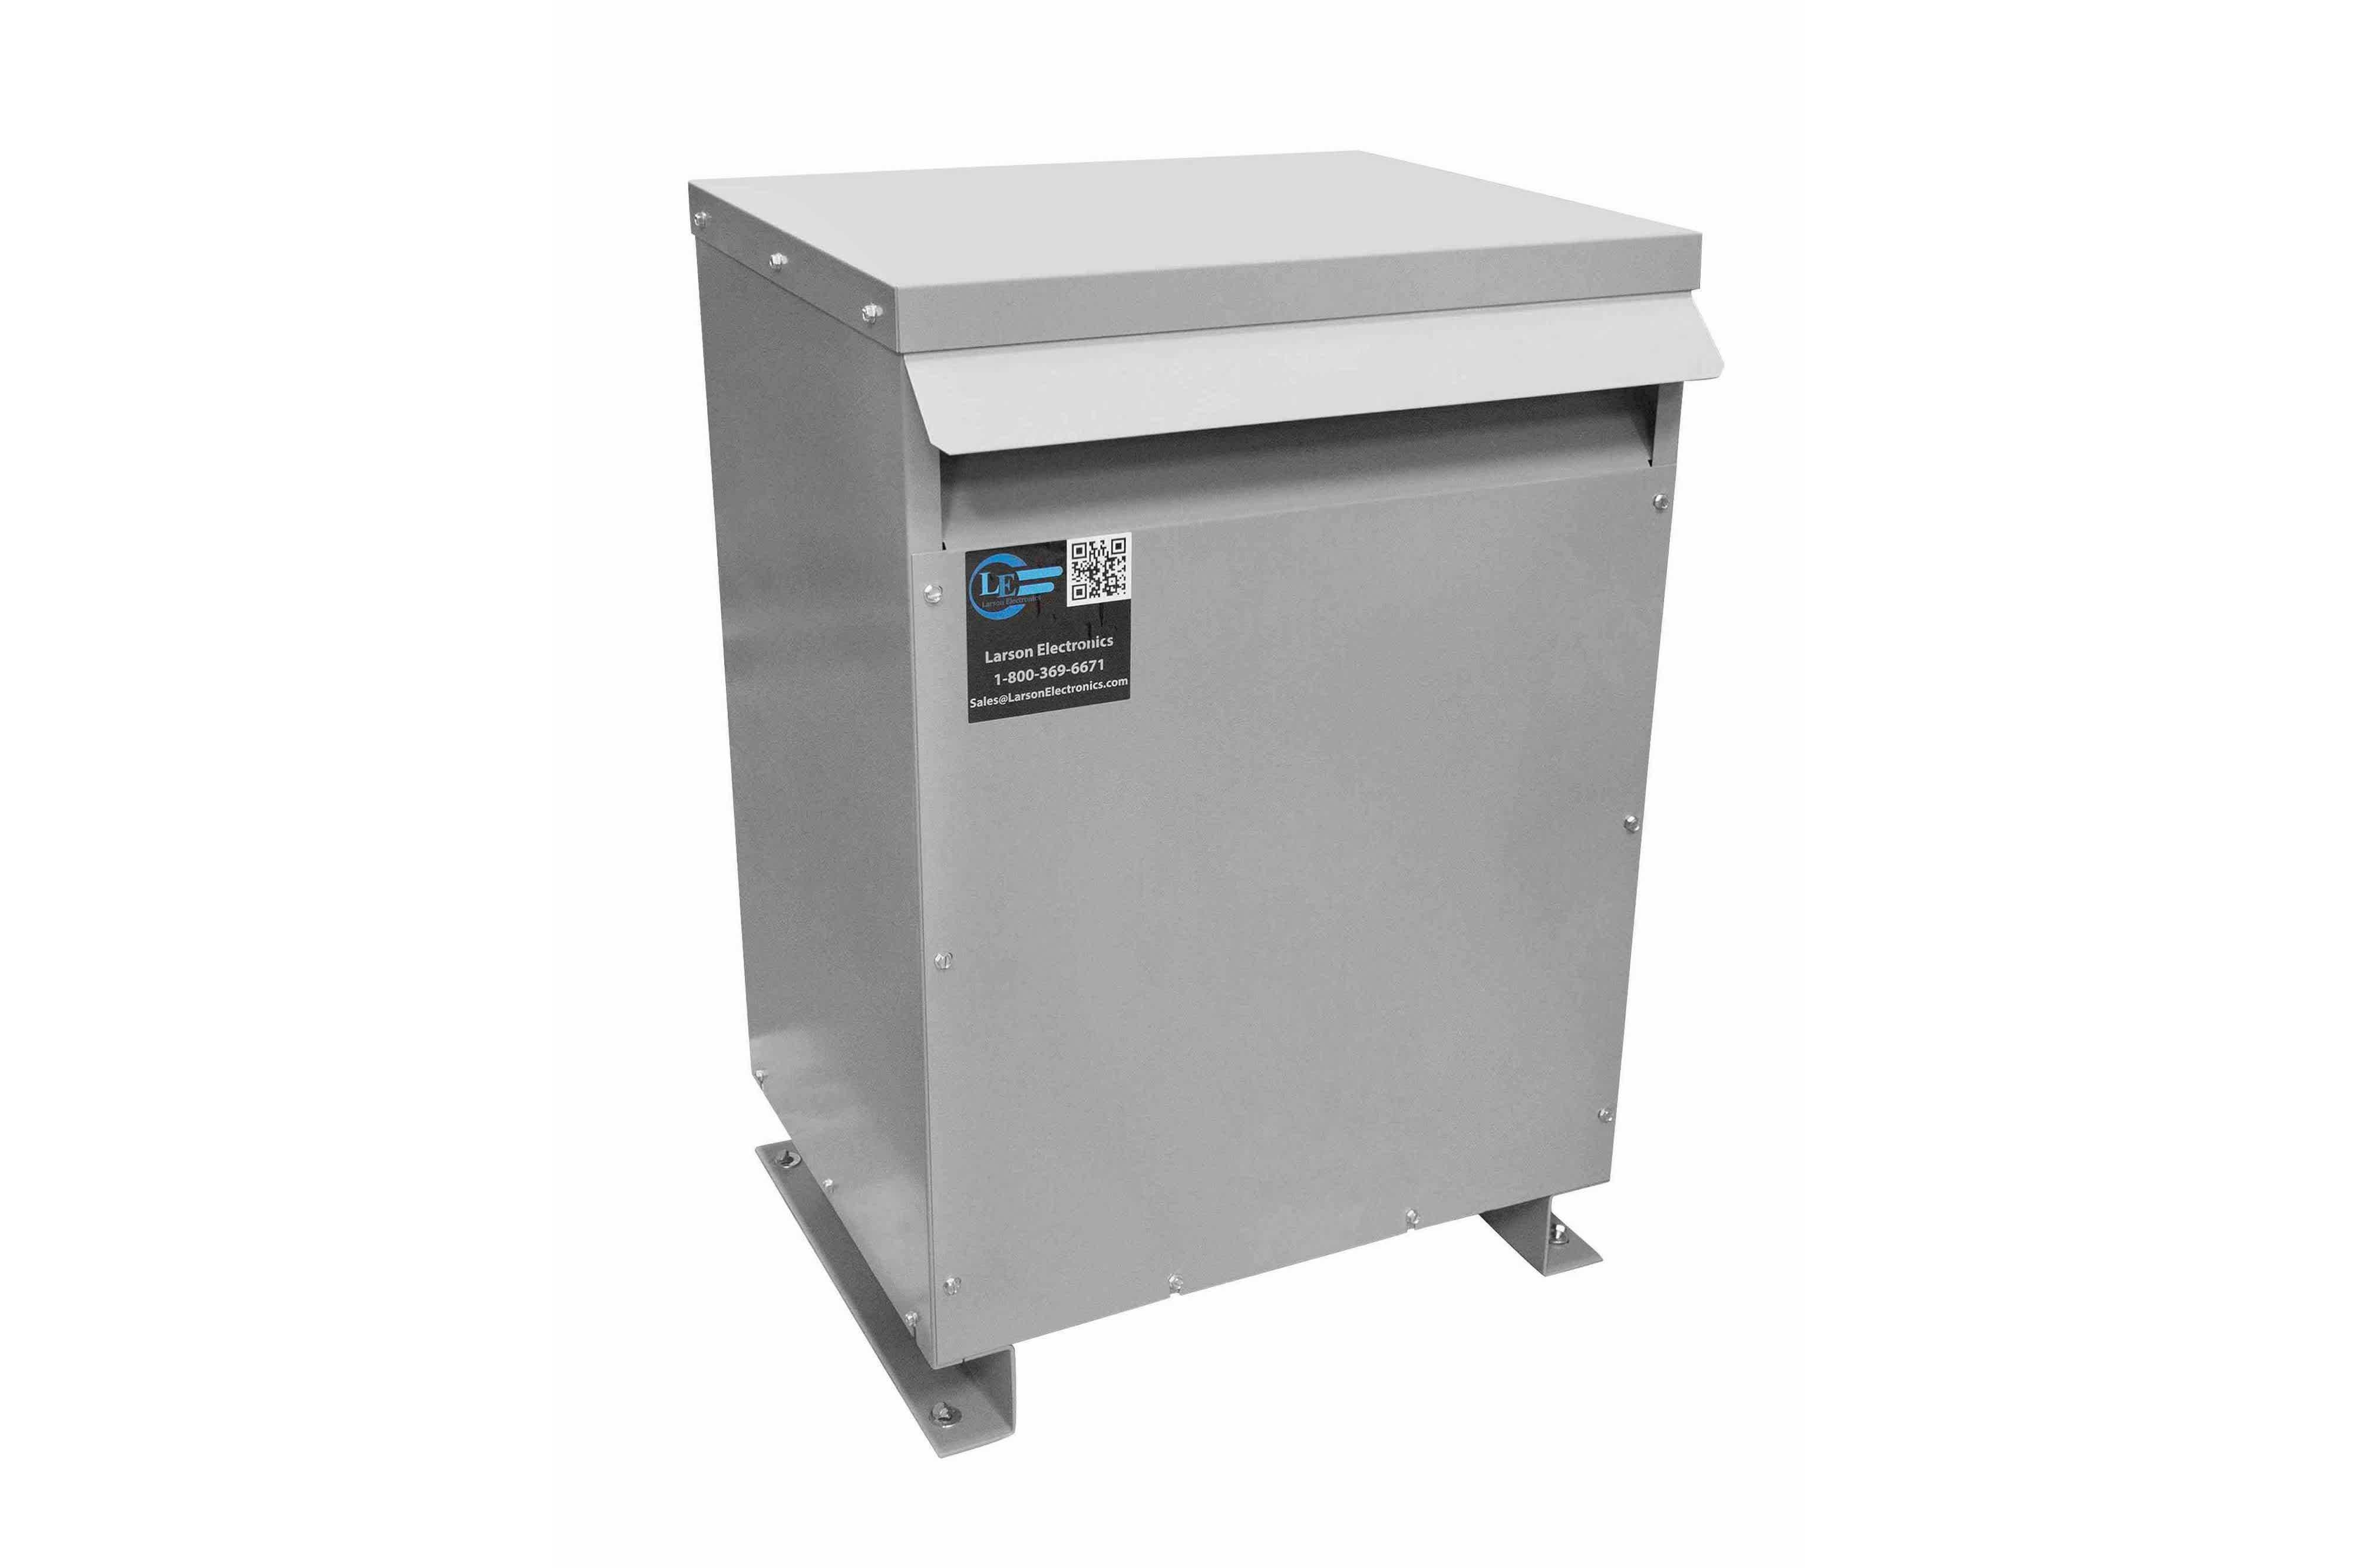 47.5 kVA 3PH Isolation Transformer, 240V Wye Primary, 415Y/240 Wye-N Secondary, N3R, Ventilated, 60 Hz